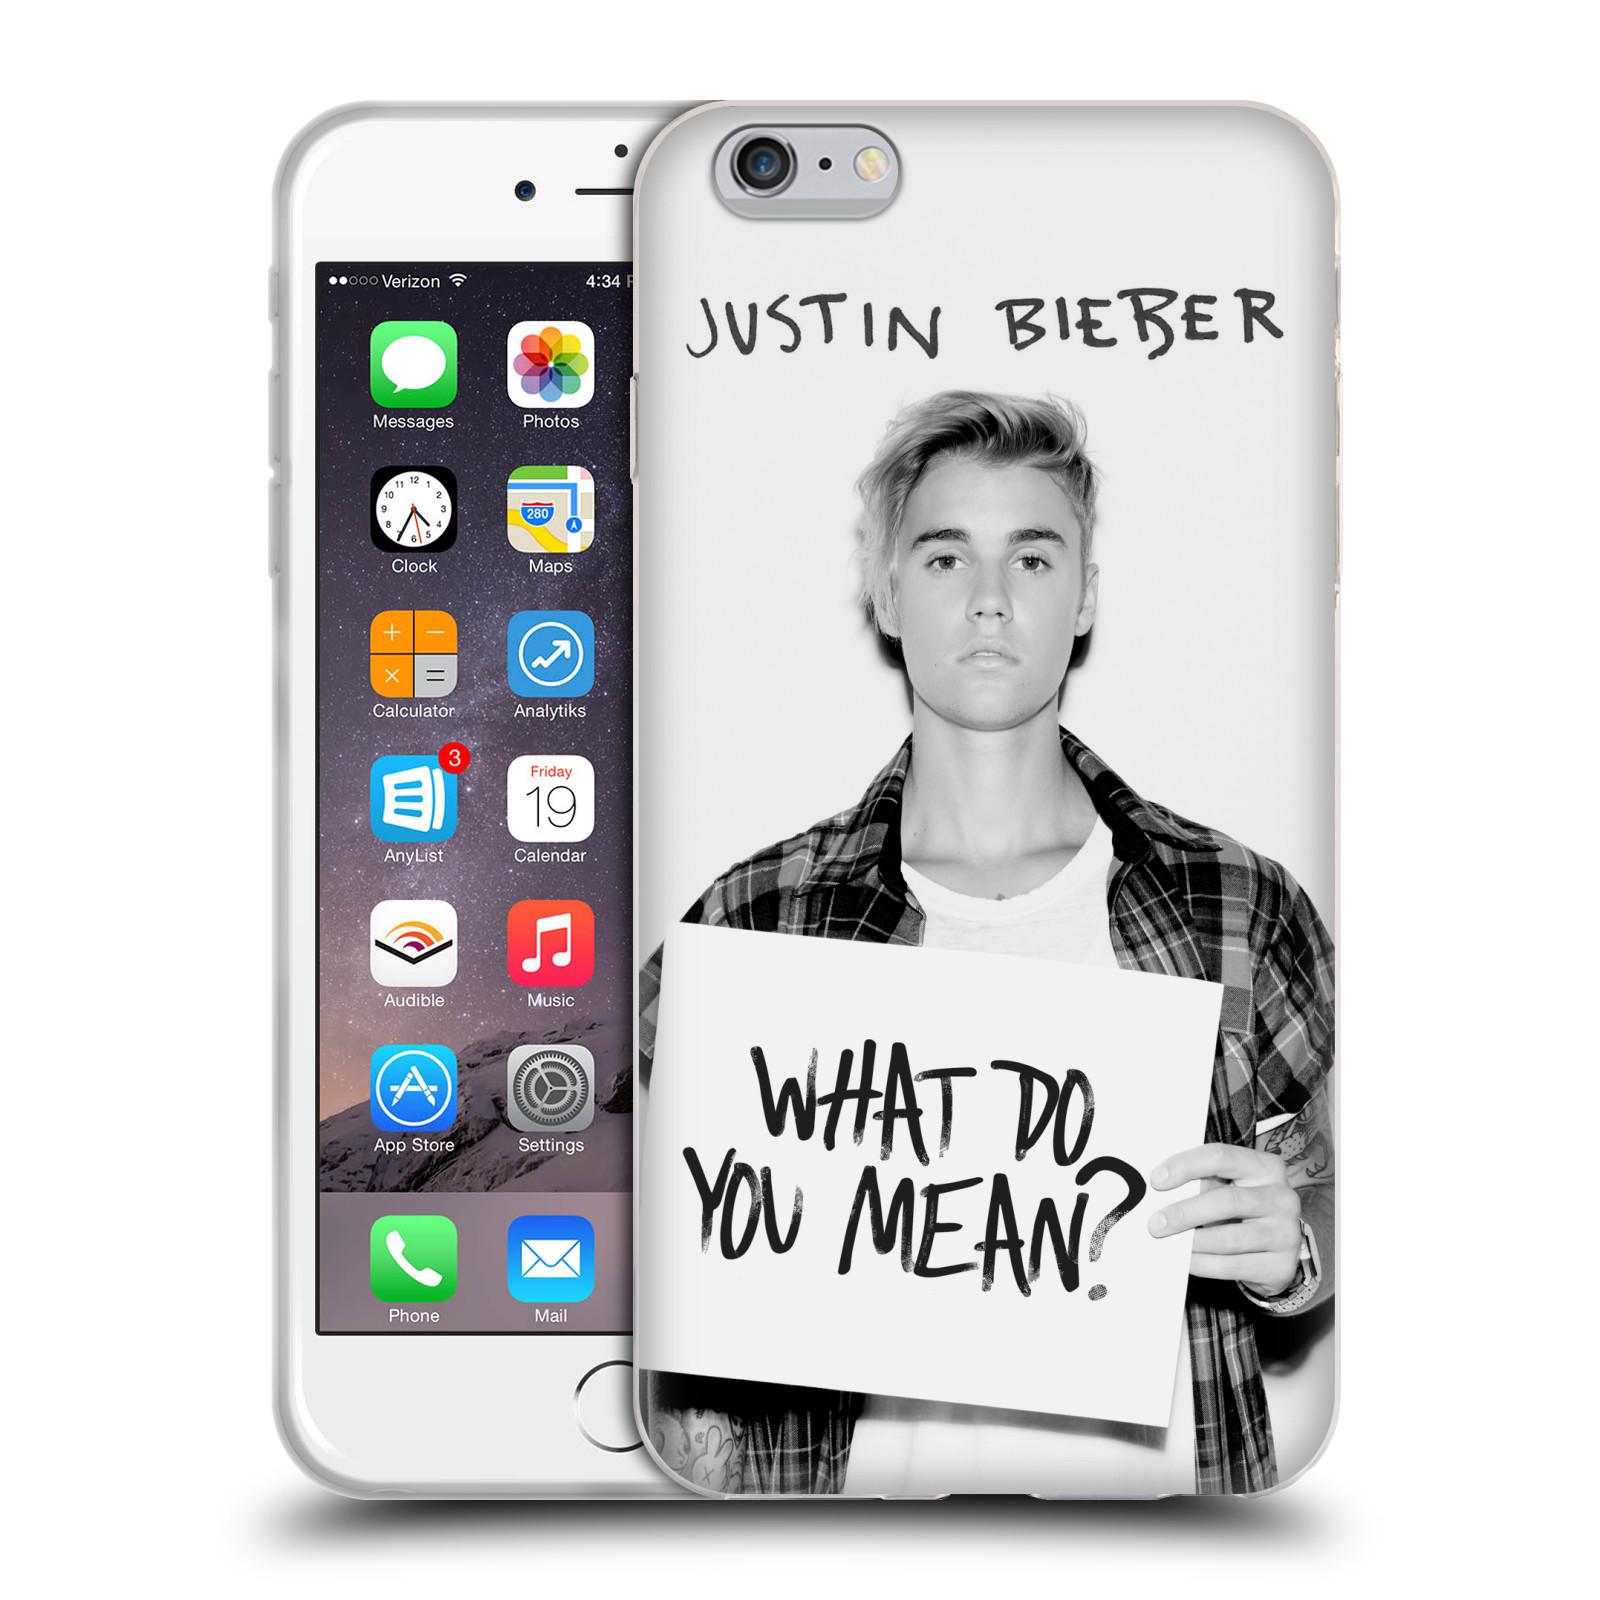 HEAD CASE silikonový obal na mobil Apple Iphone 6 PLUS / 6S PLUS originální potisk Justin Bieber What do you mean